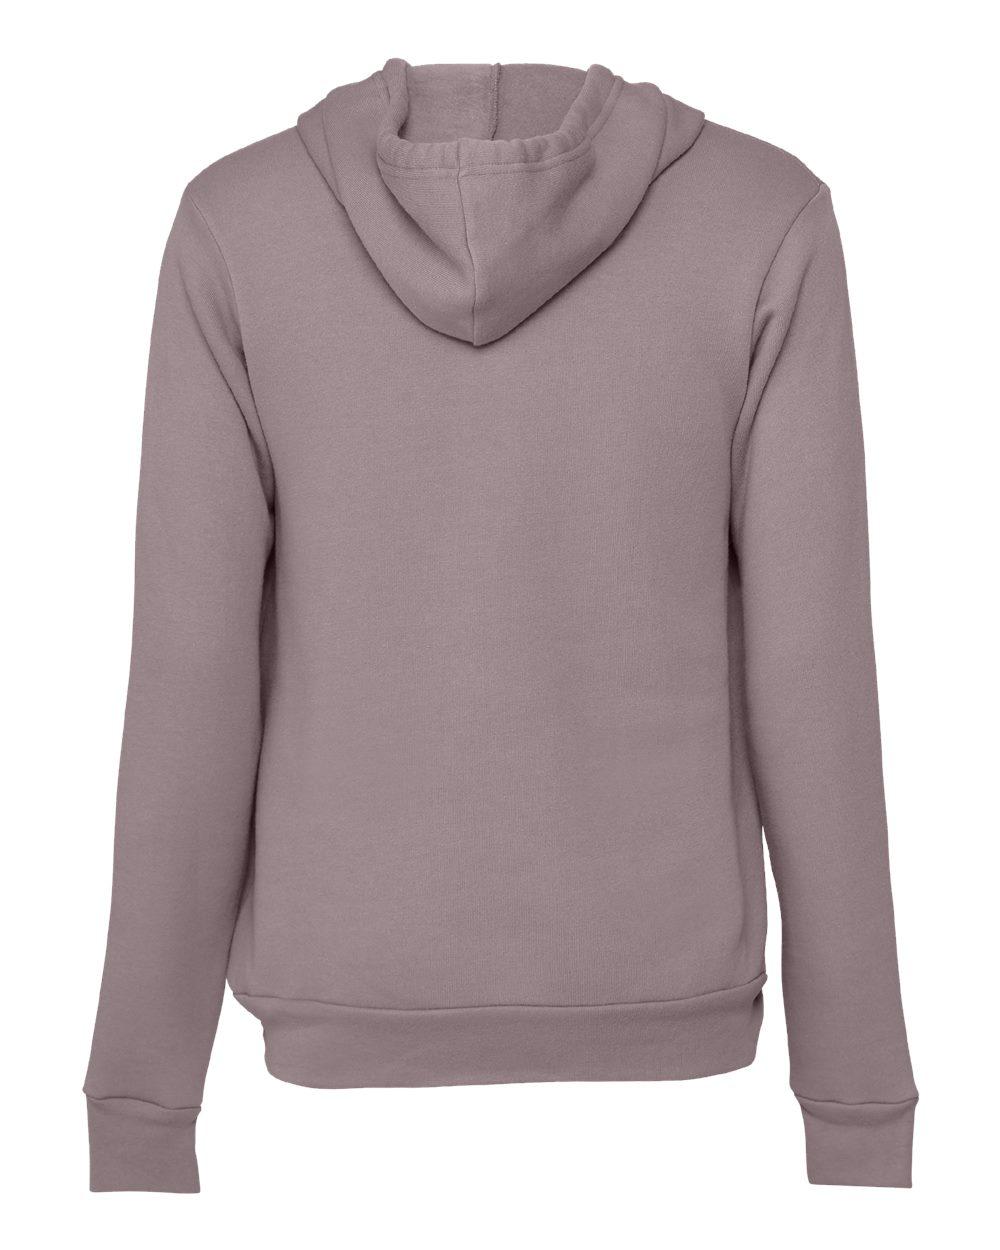 Bella-Canvas-Unisex-Sponge-Hooded-Pullover-Sweatshirt-Blank-3719-up-to-2XL thumbnail 89